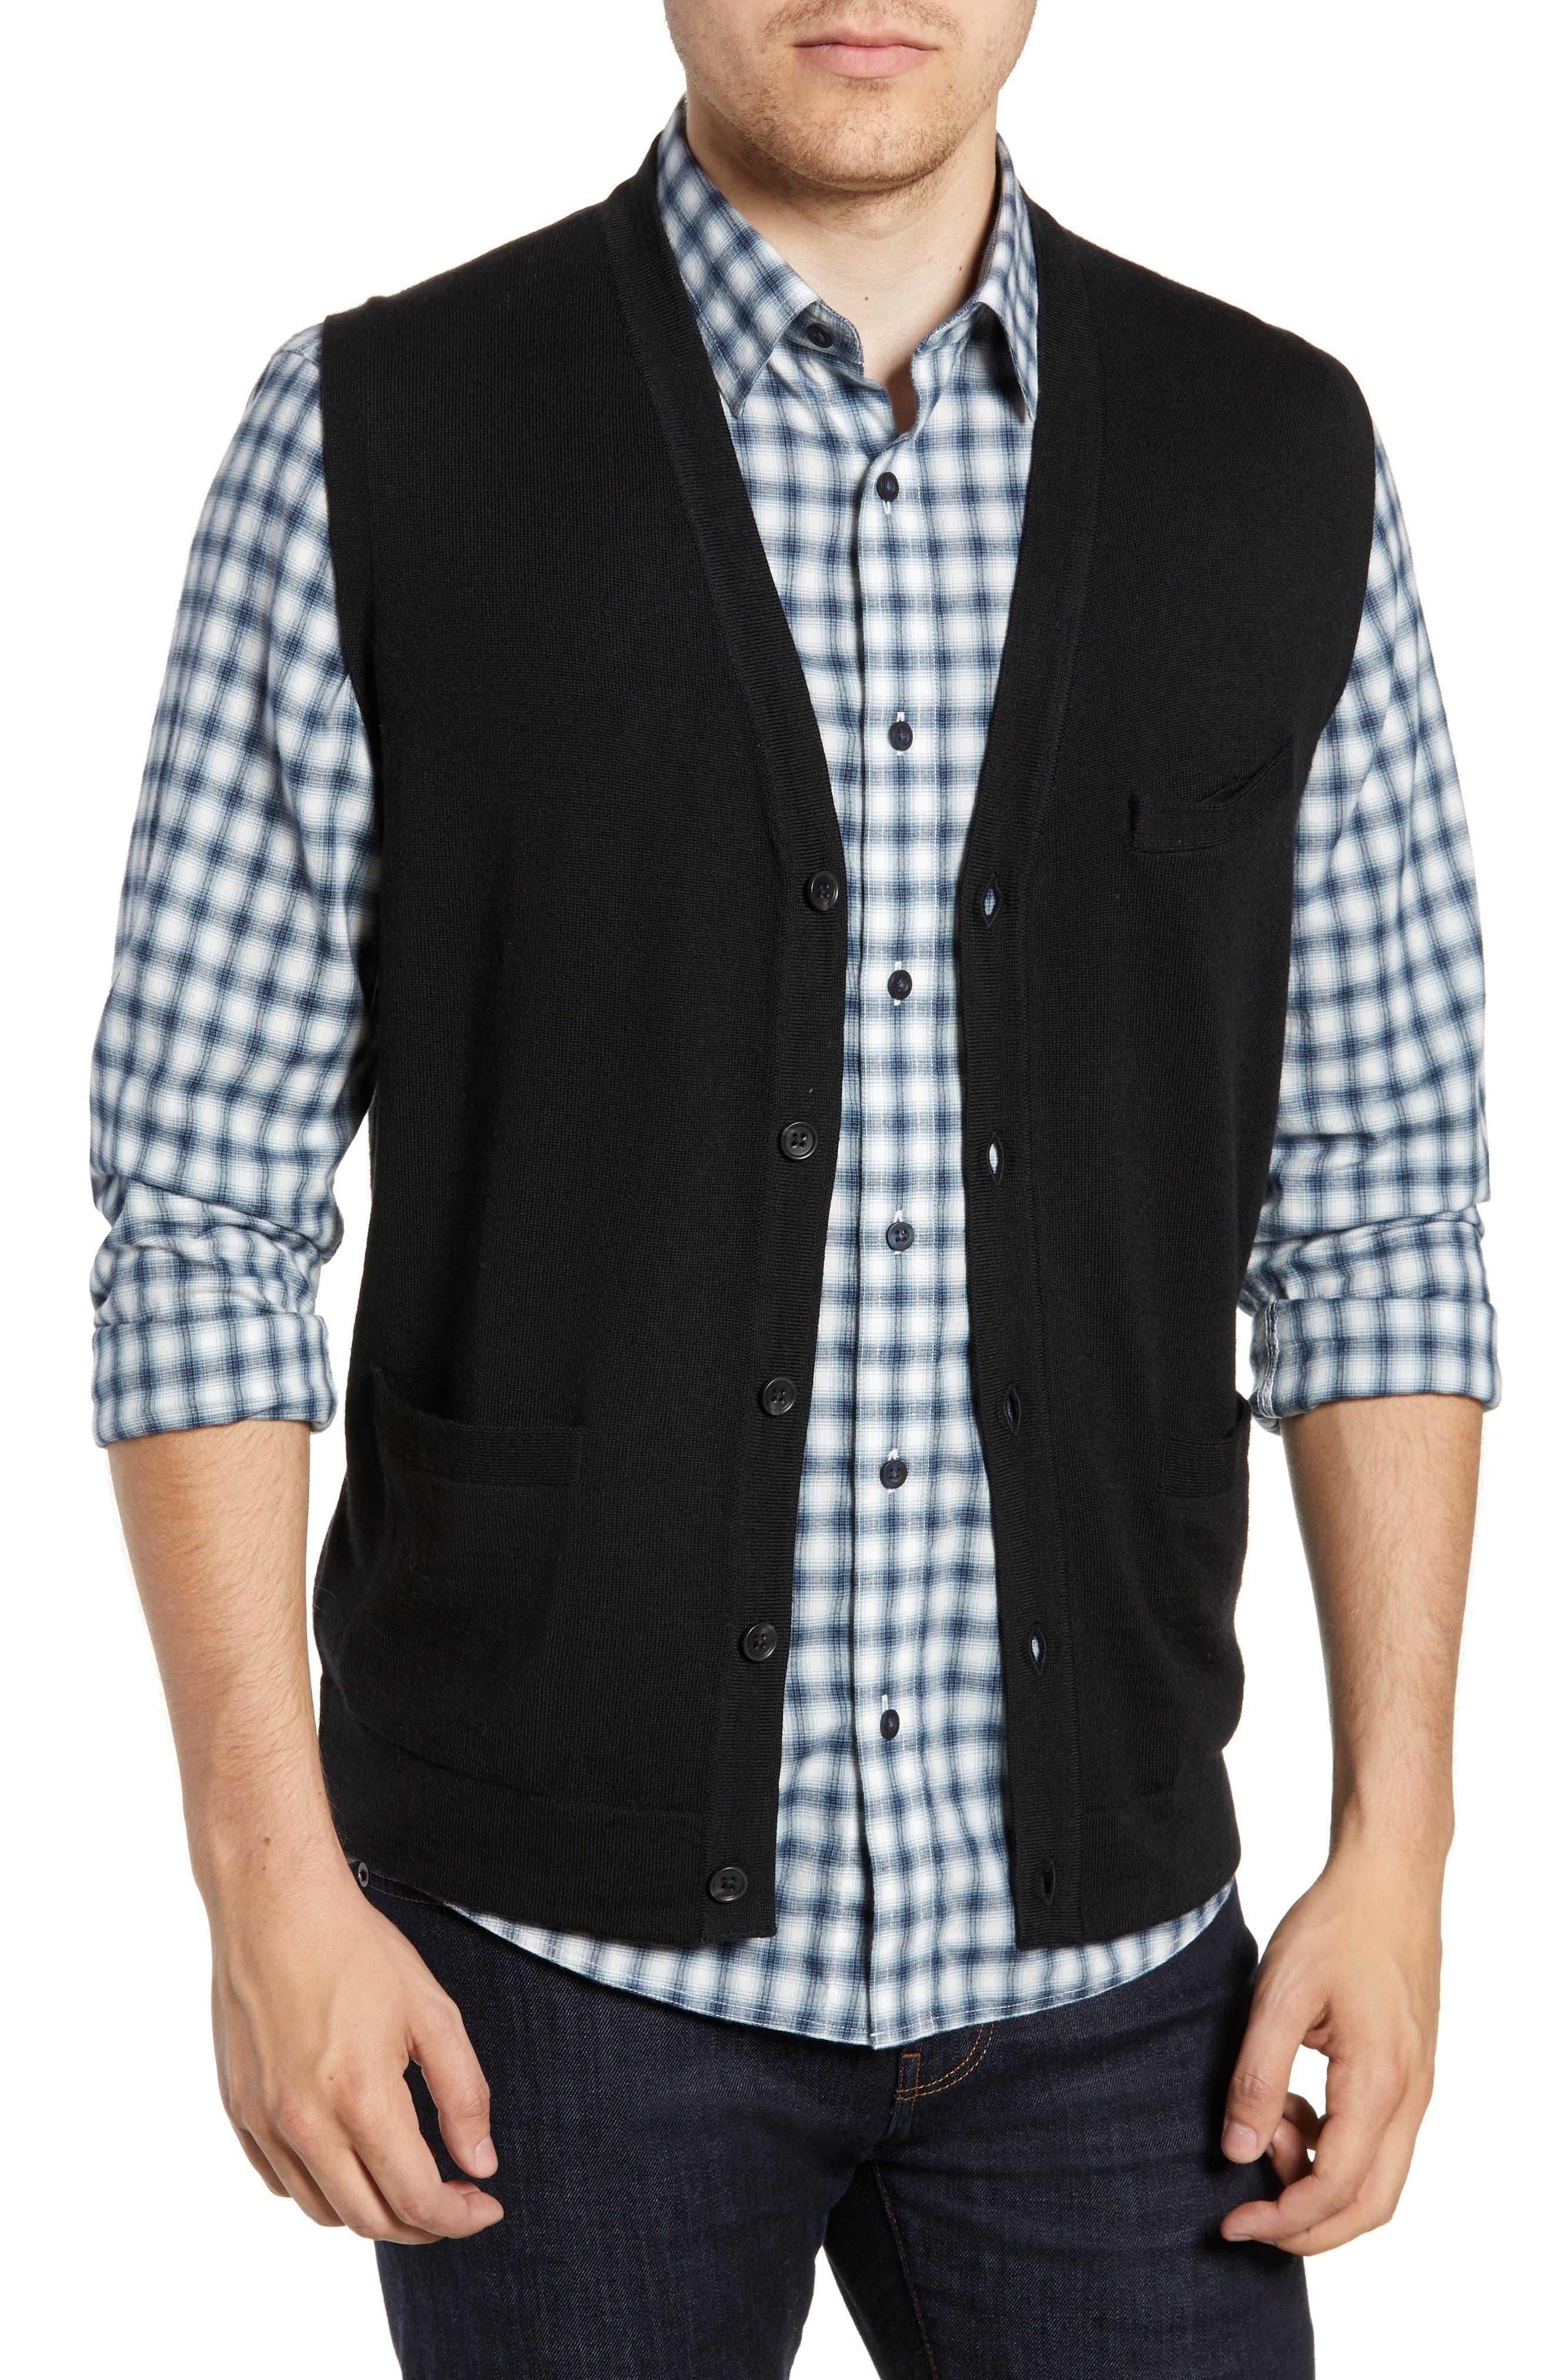 Nordstrom Shop Merino Button Front Sweater Vest, Black